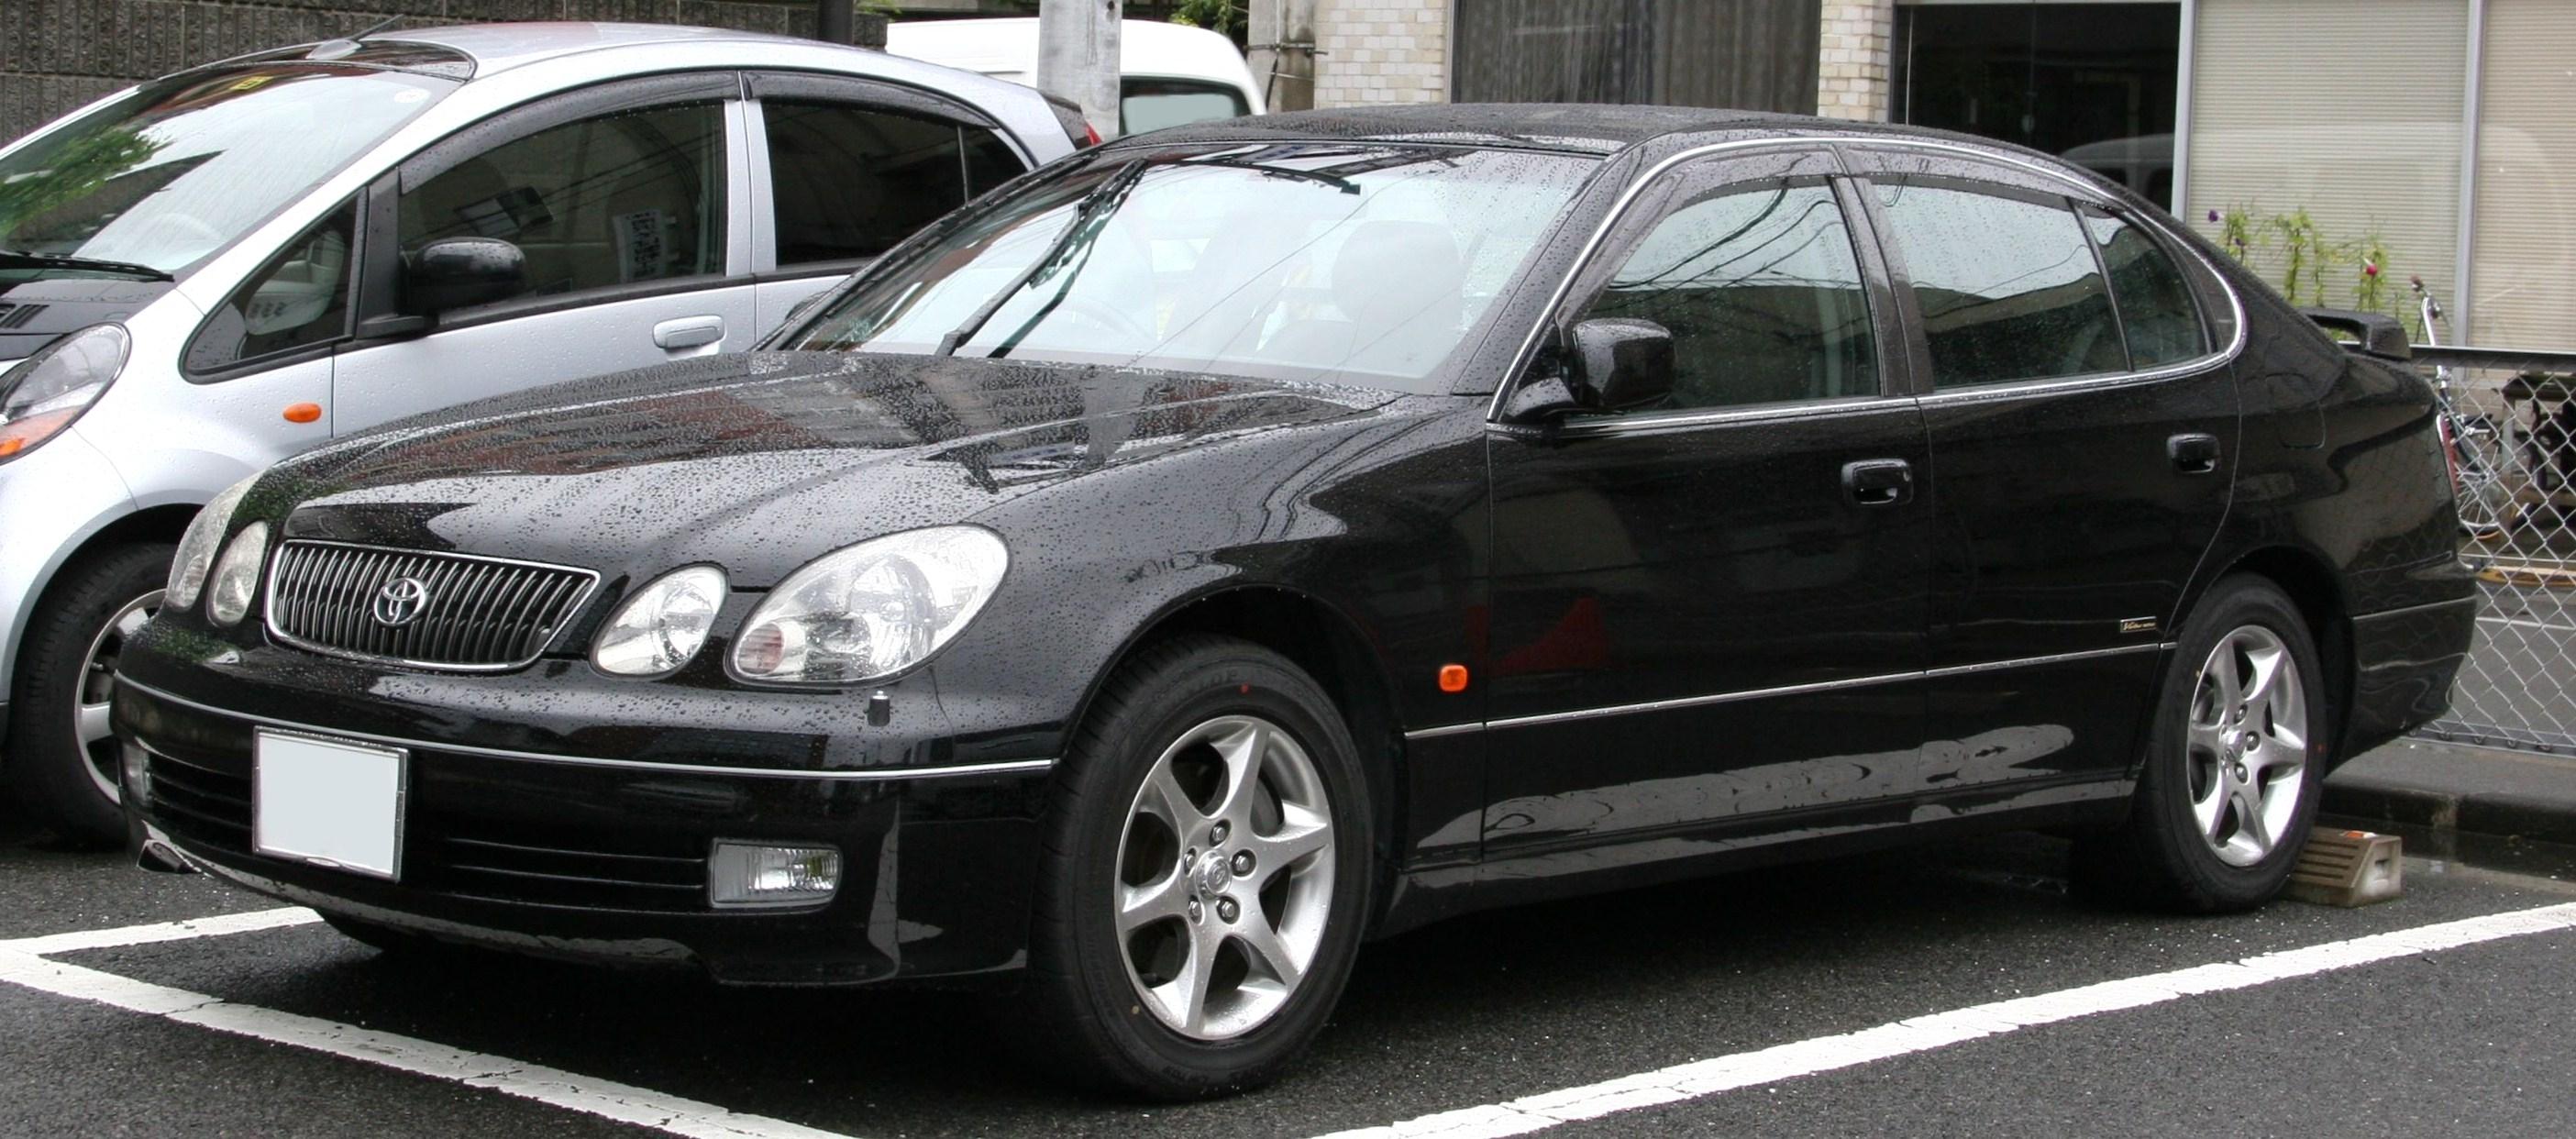 Lexus GS | Wiki | Everipedia